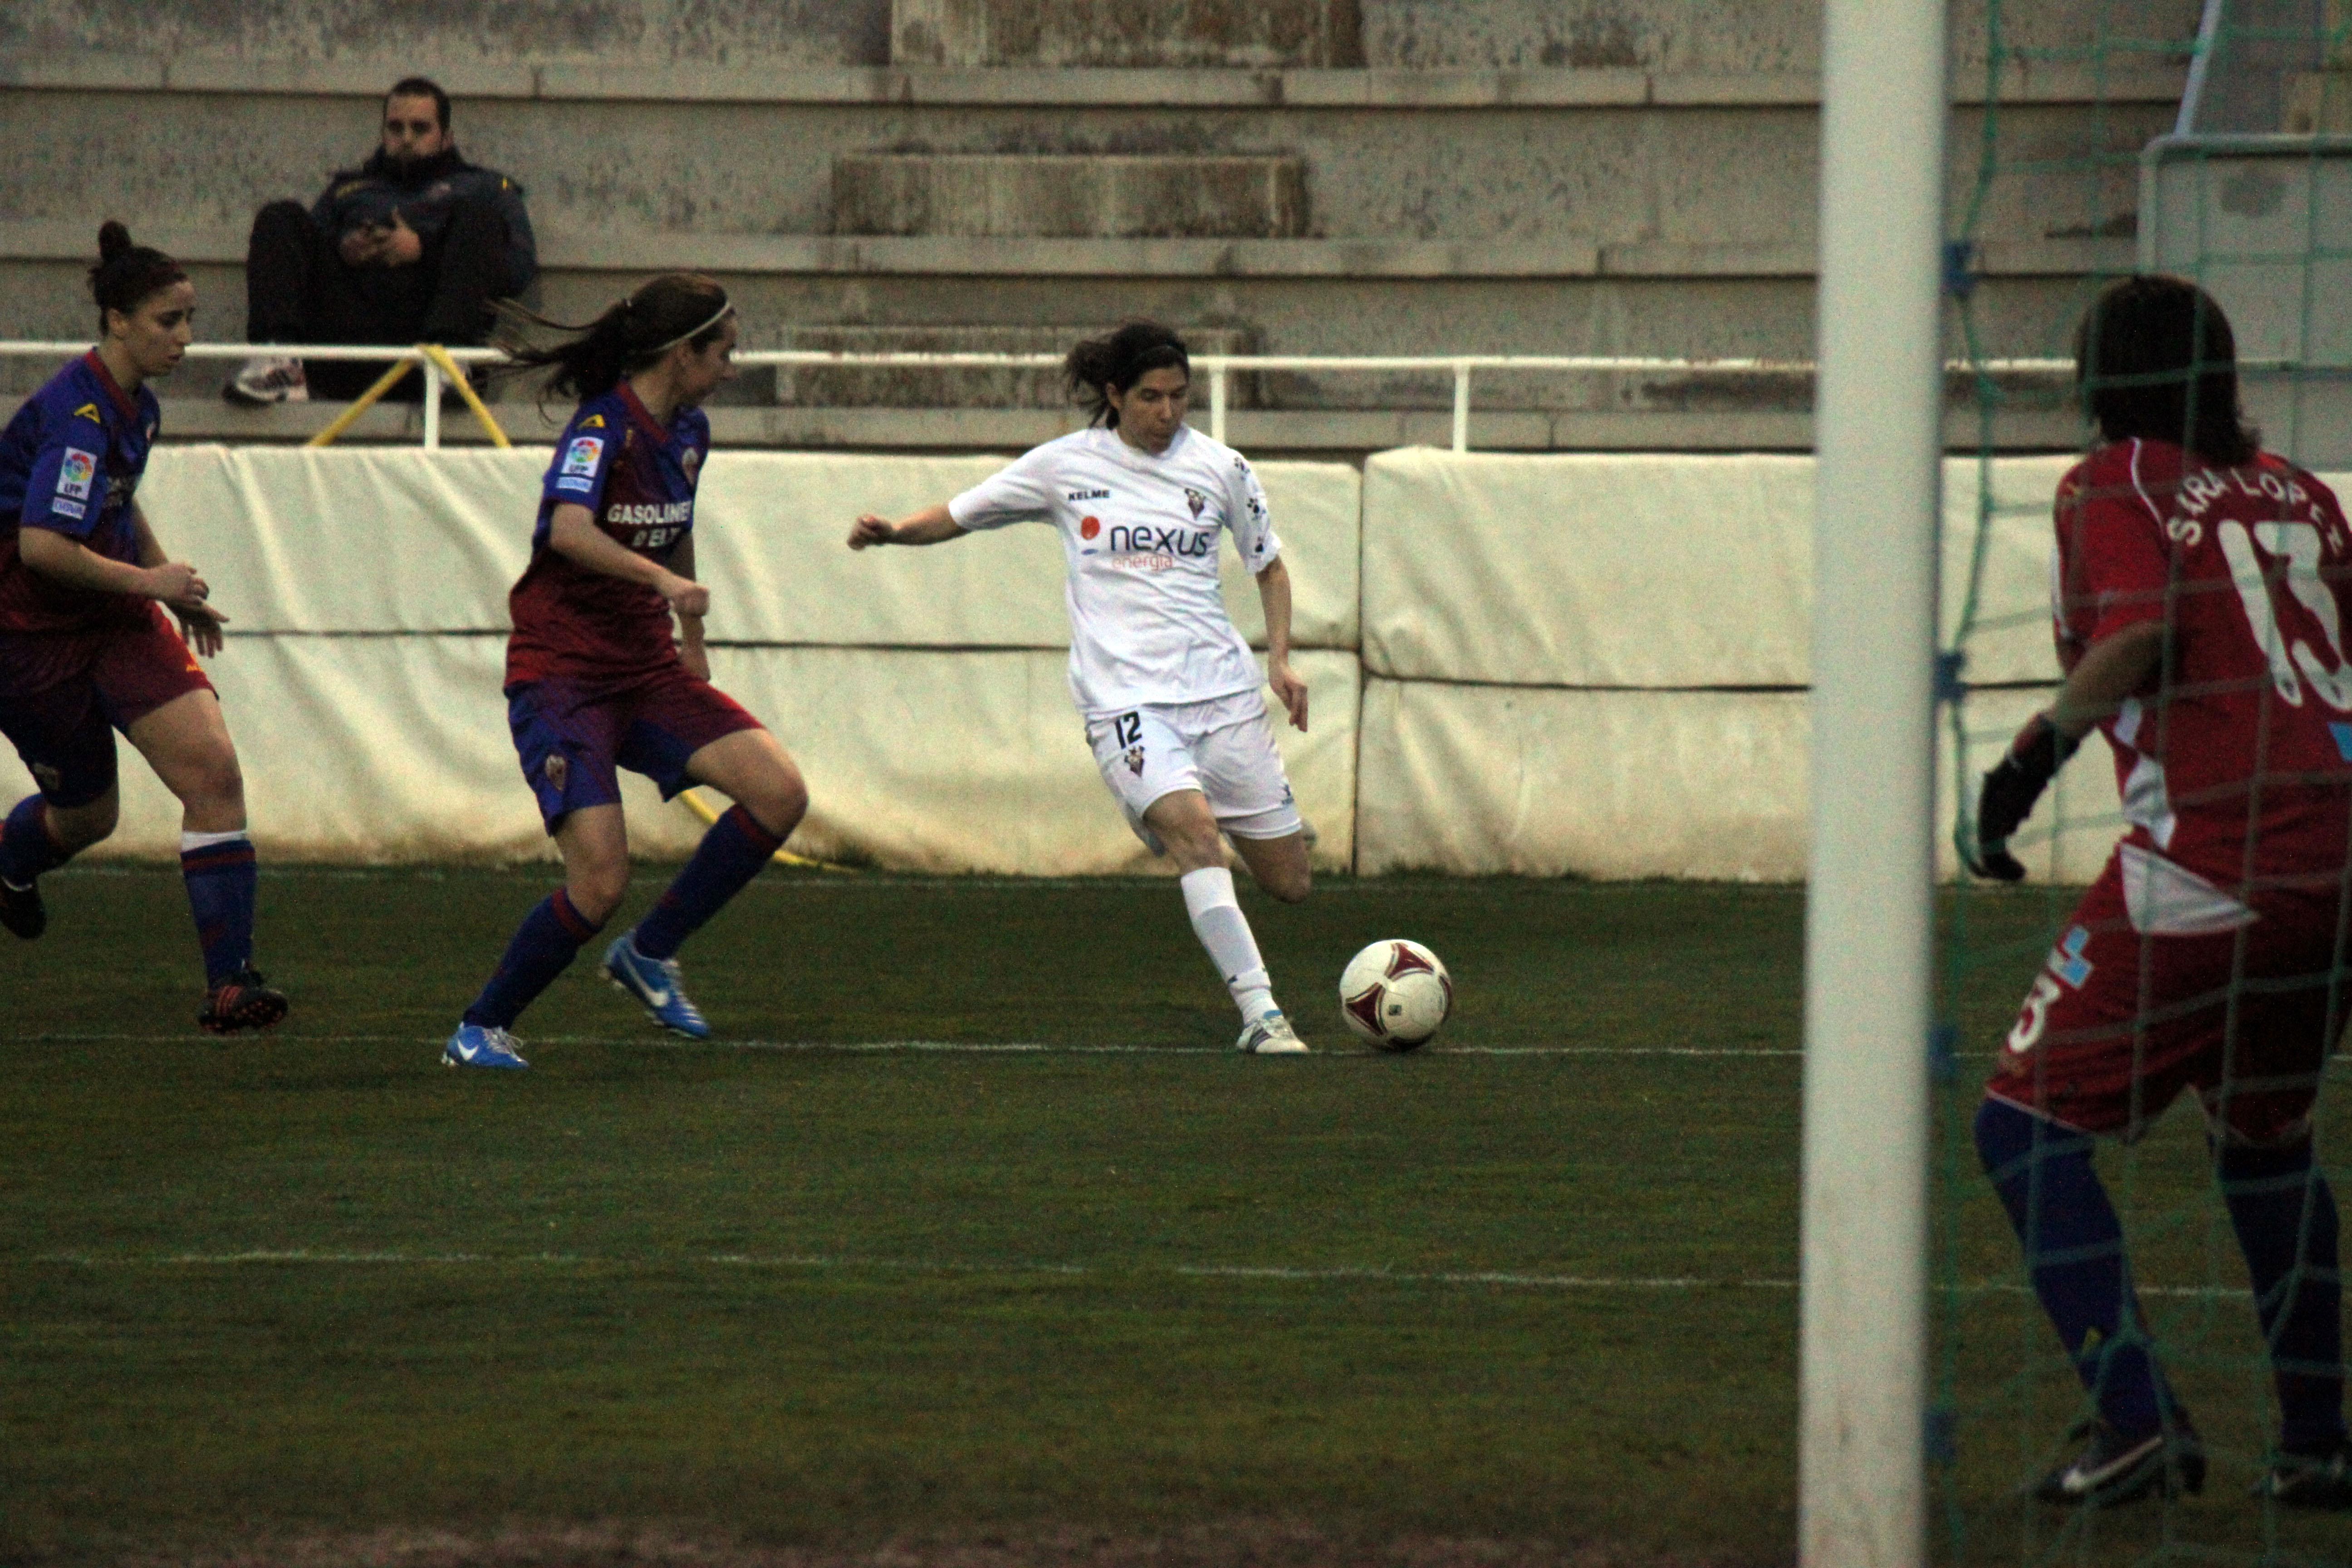 Vanesa Lorca (Foto: www.5maseldescuento.es)